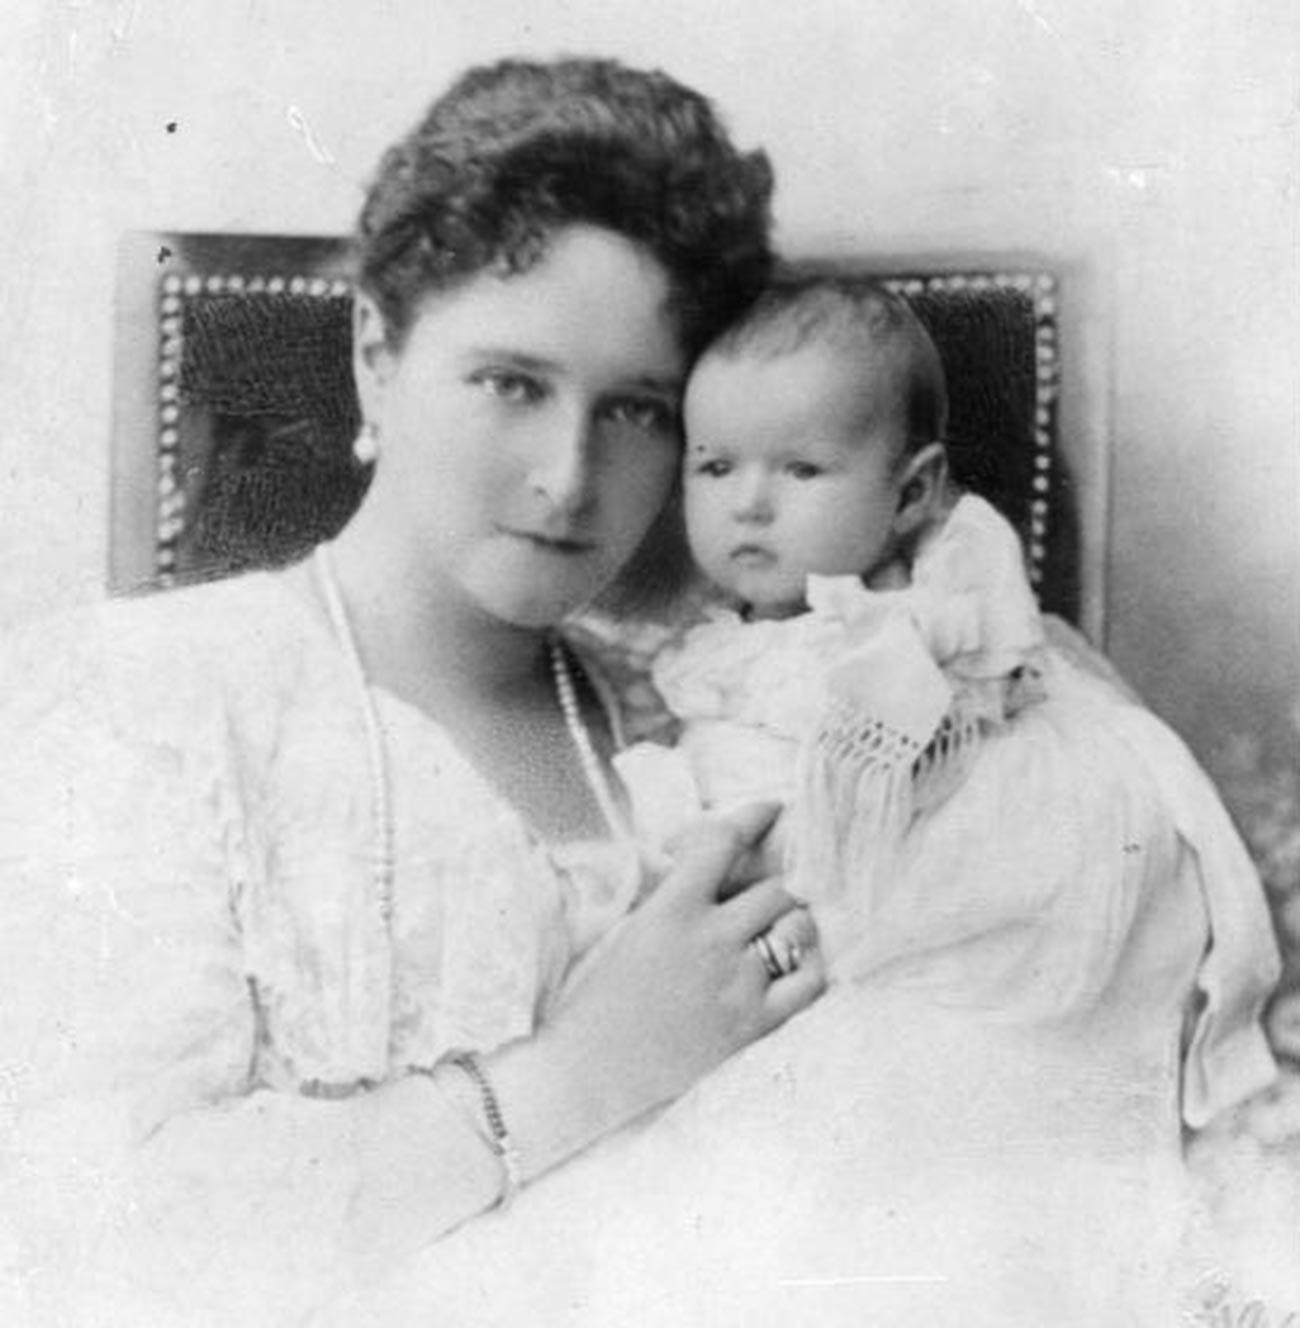 Empress Alexandra Fyodorovna with Anastasia as a toddler.